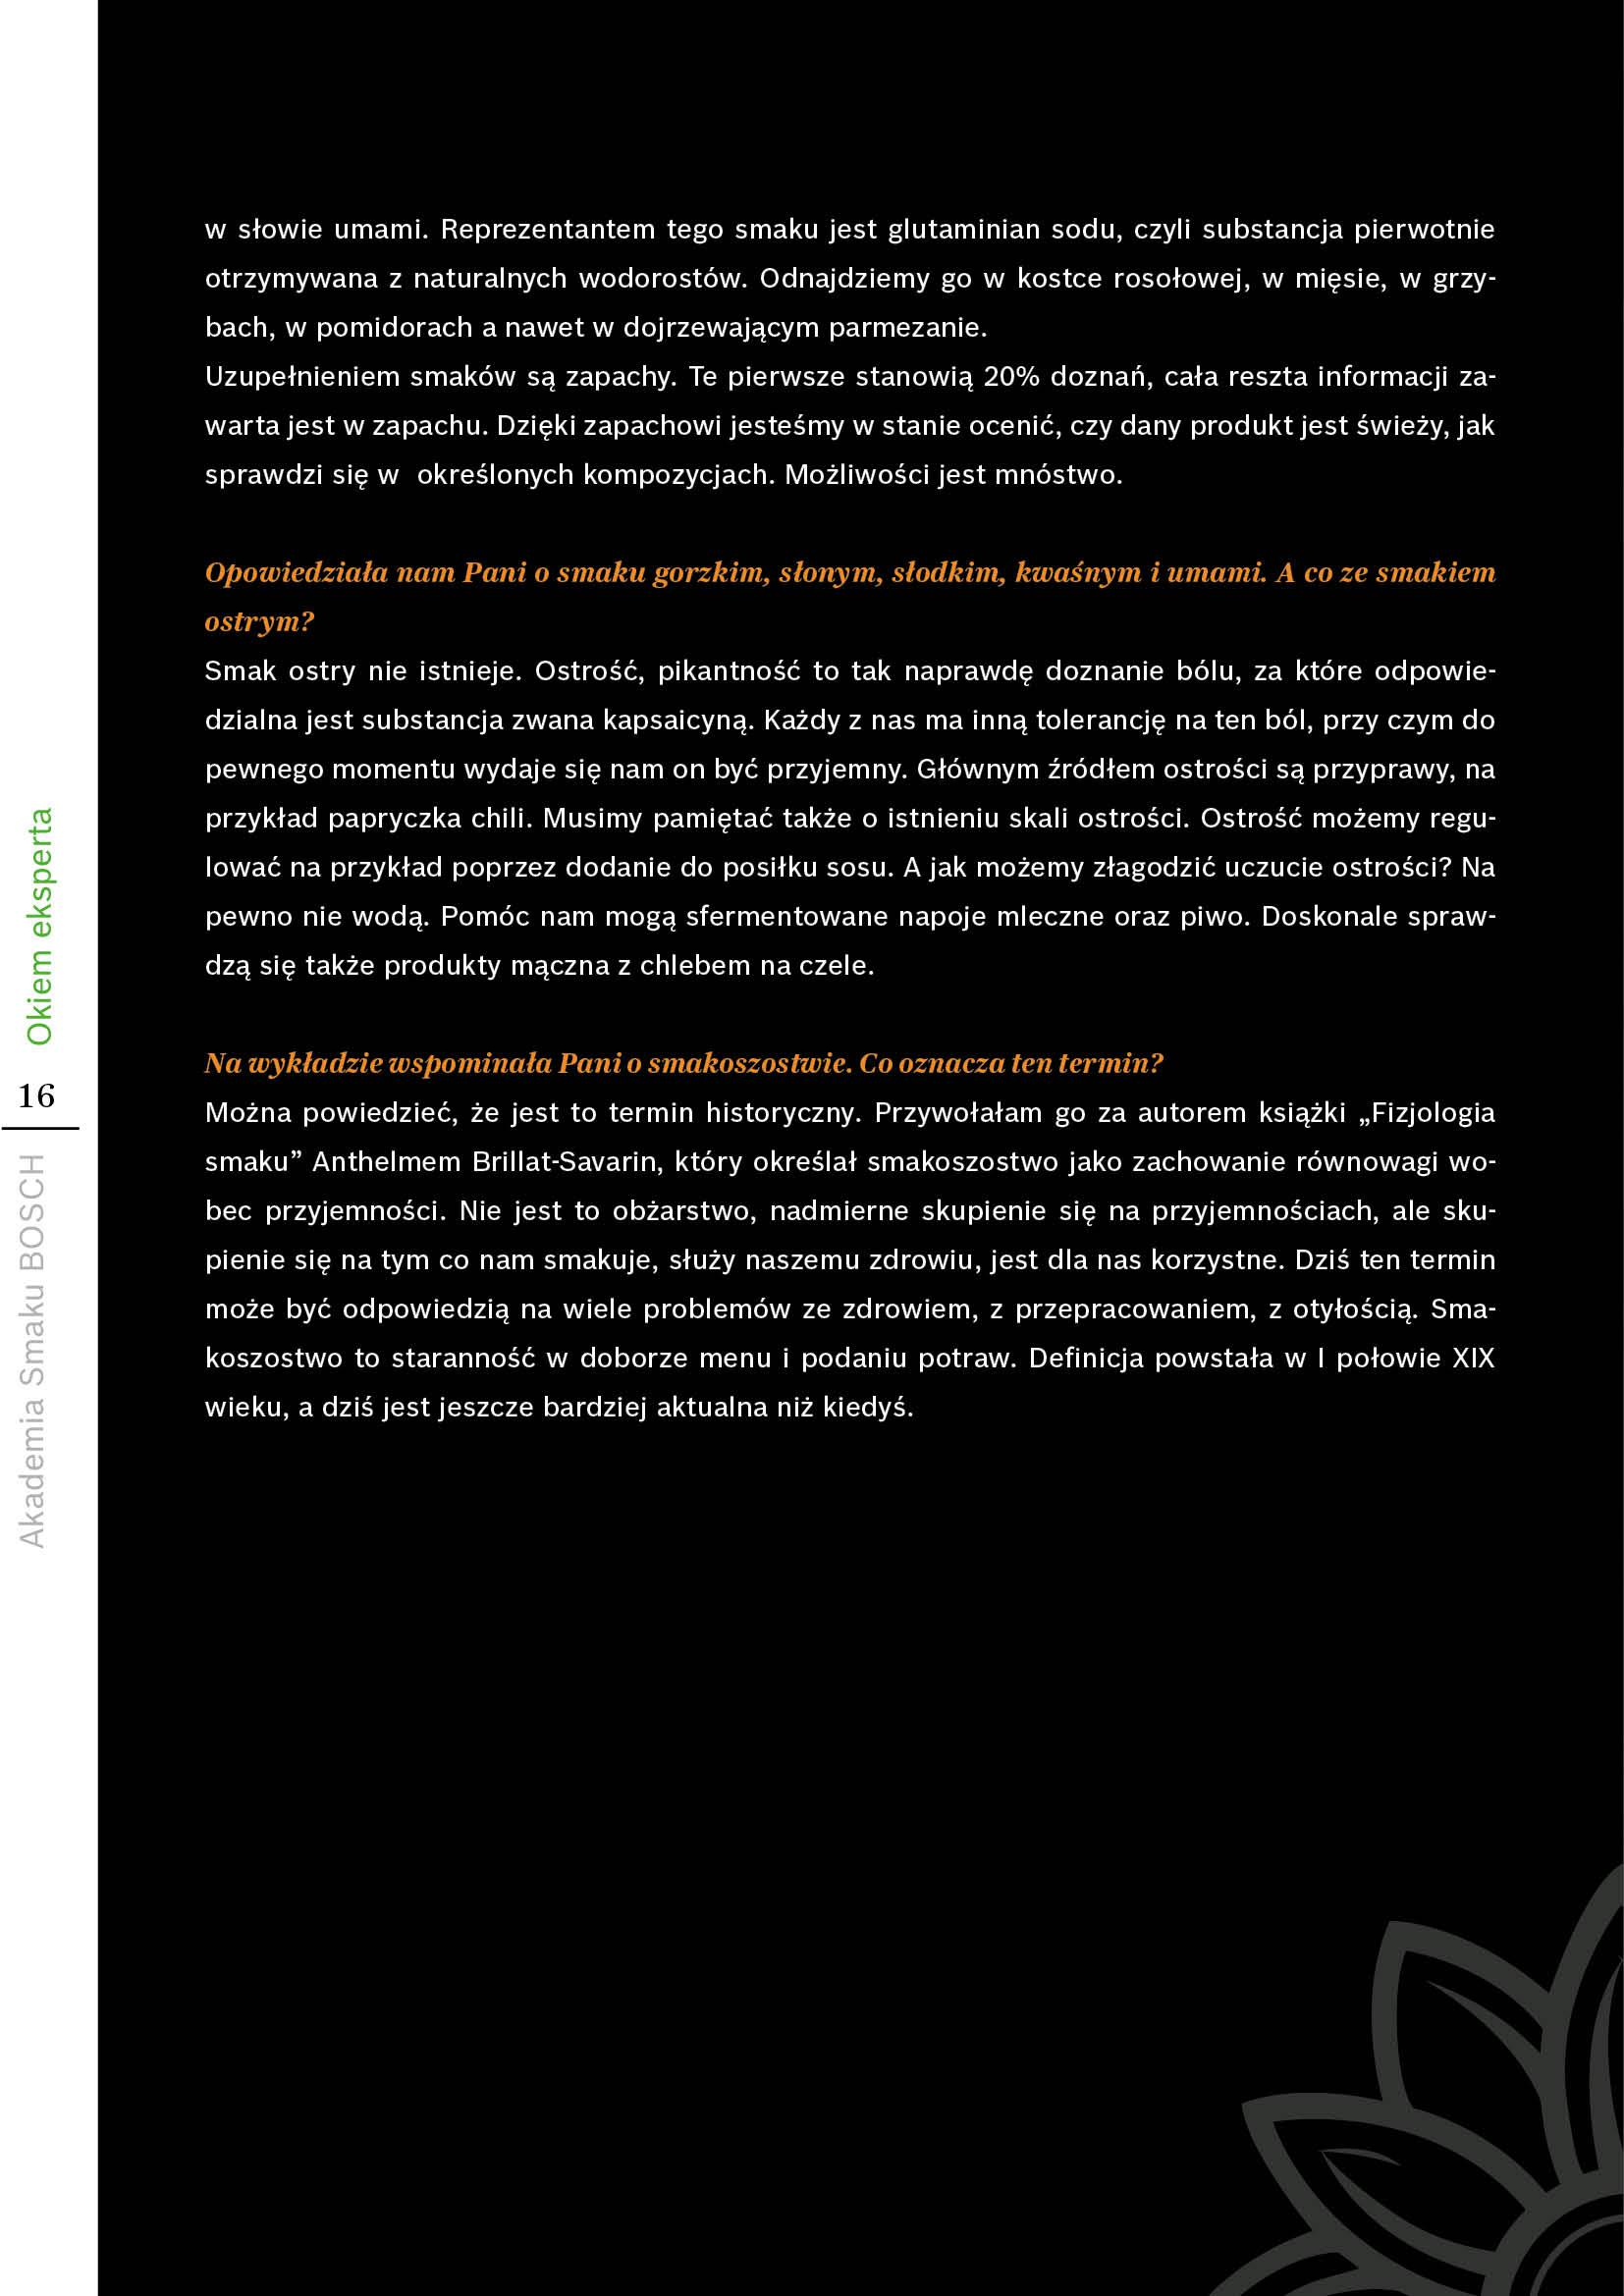 Filozofia smaku - Strona 16